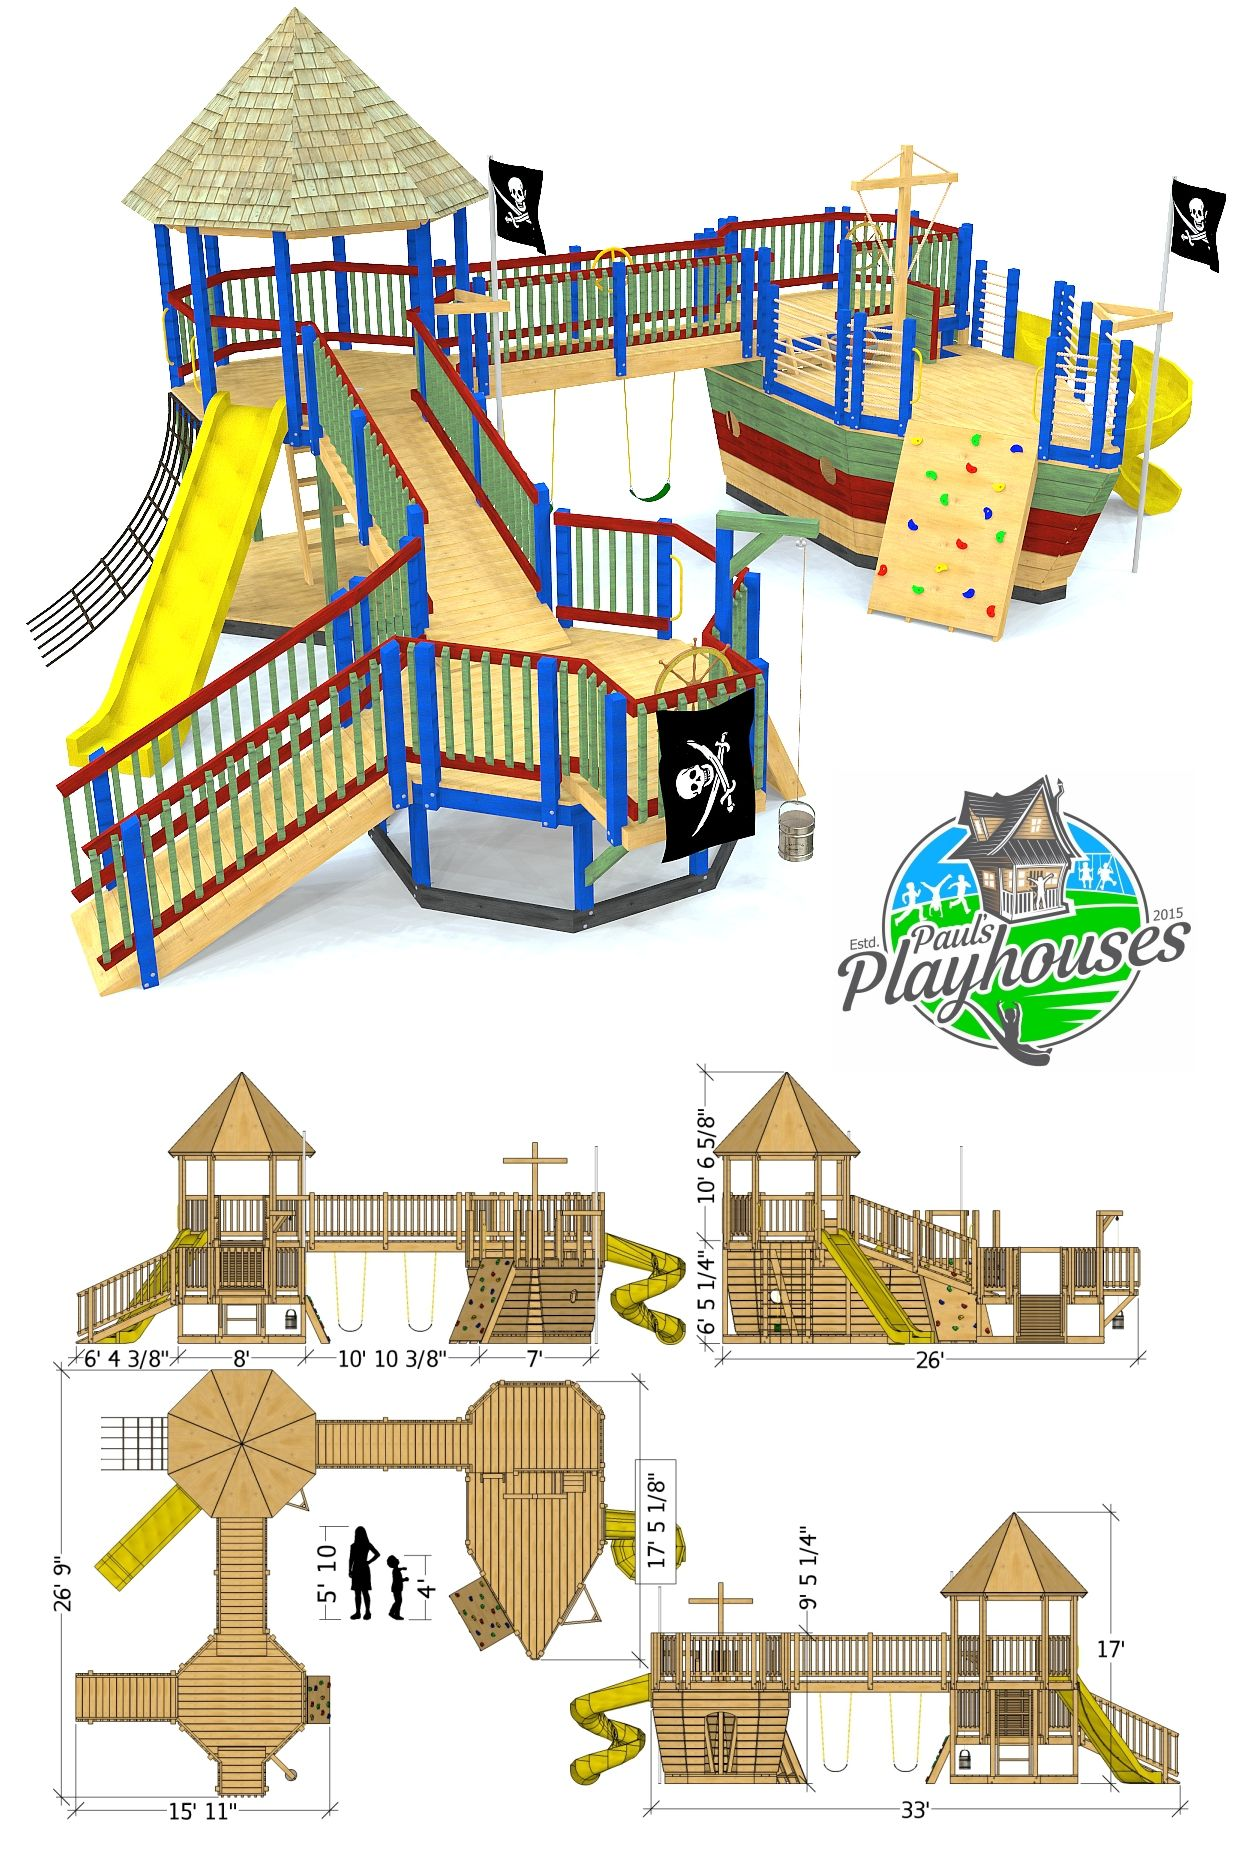 Edward Thatch Pirateship Playground Plan